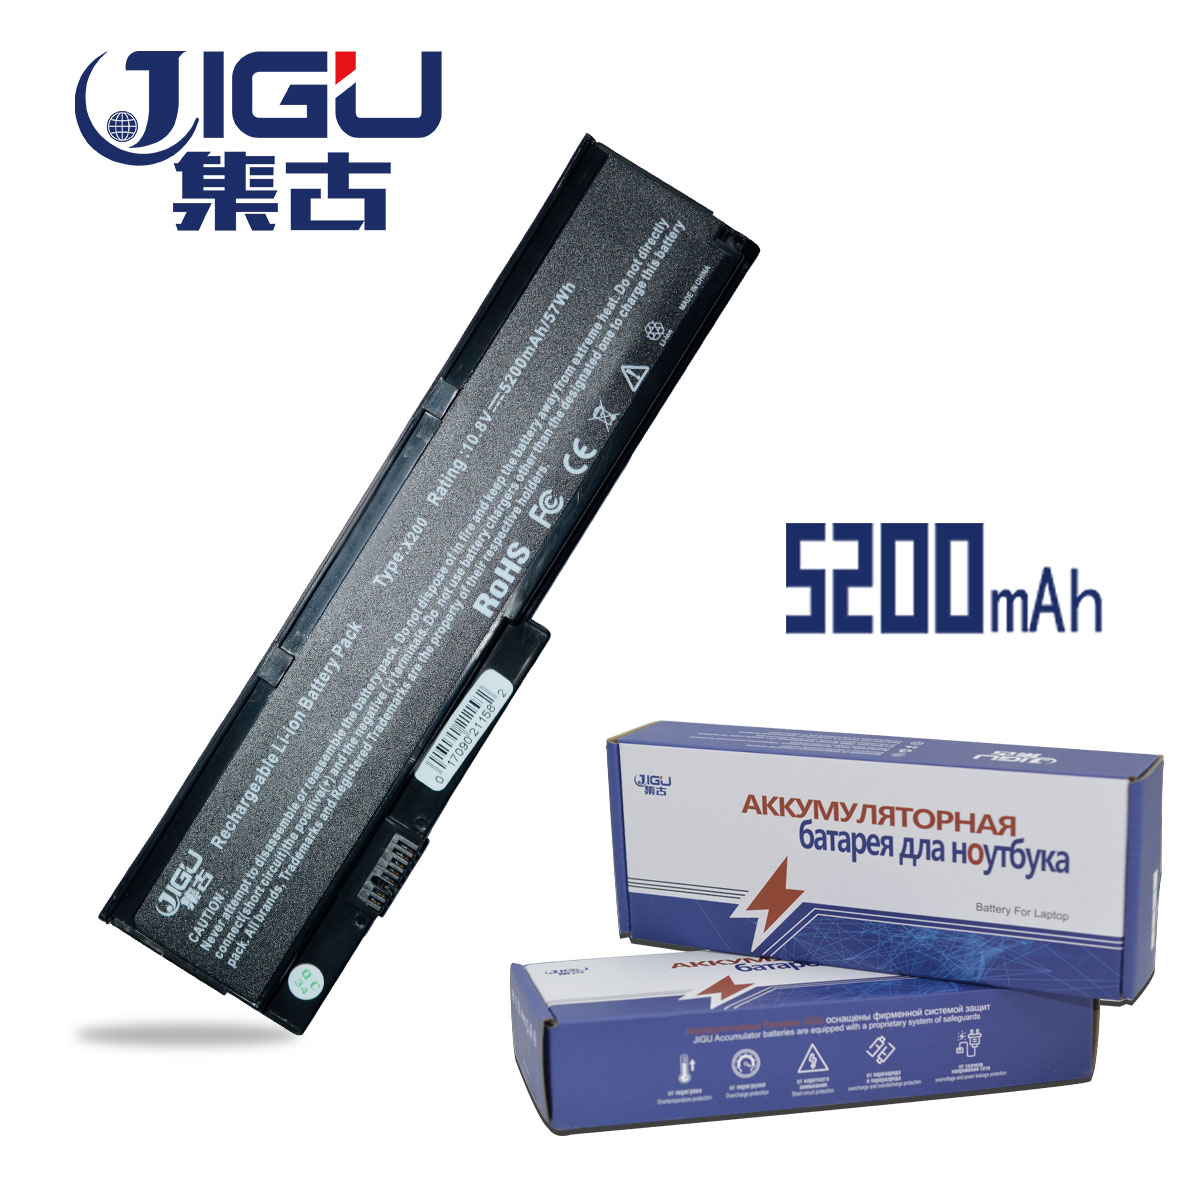 JIGU Laptop Battery For Lenovo ThinkPad X200 X200s X201 X201i X201s 42T4834 42T4835 43R9254 ASM 42T4537 FRU 42T4536 FRU 42T4538